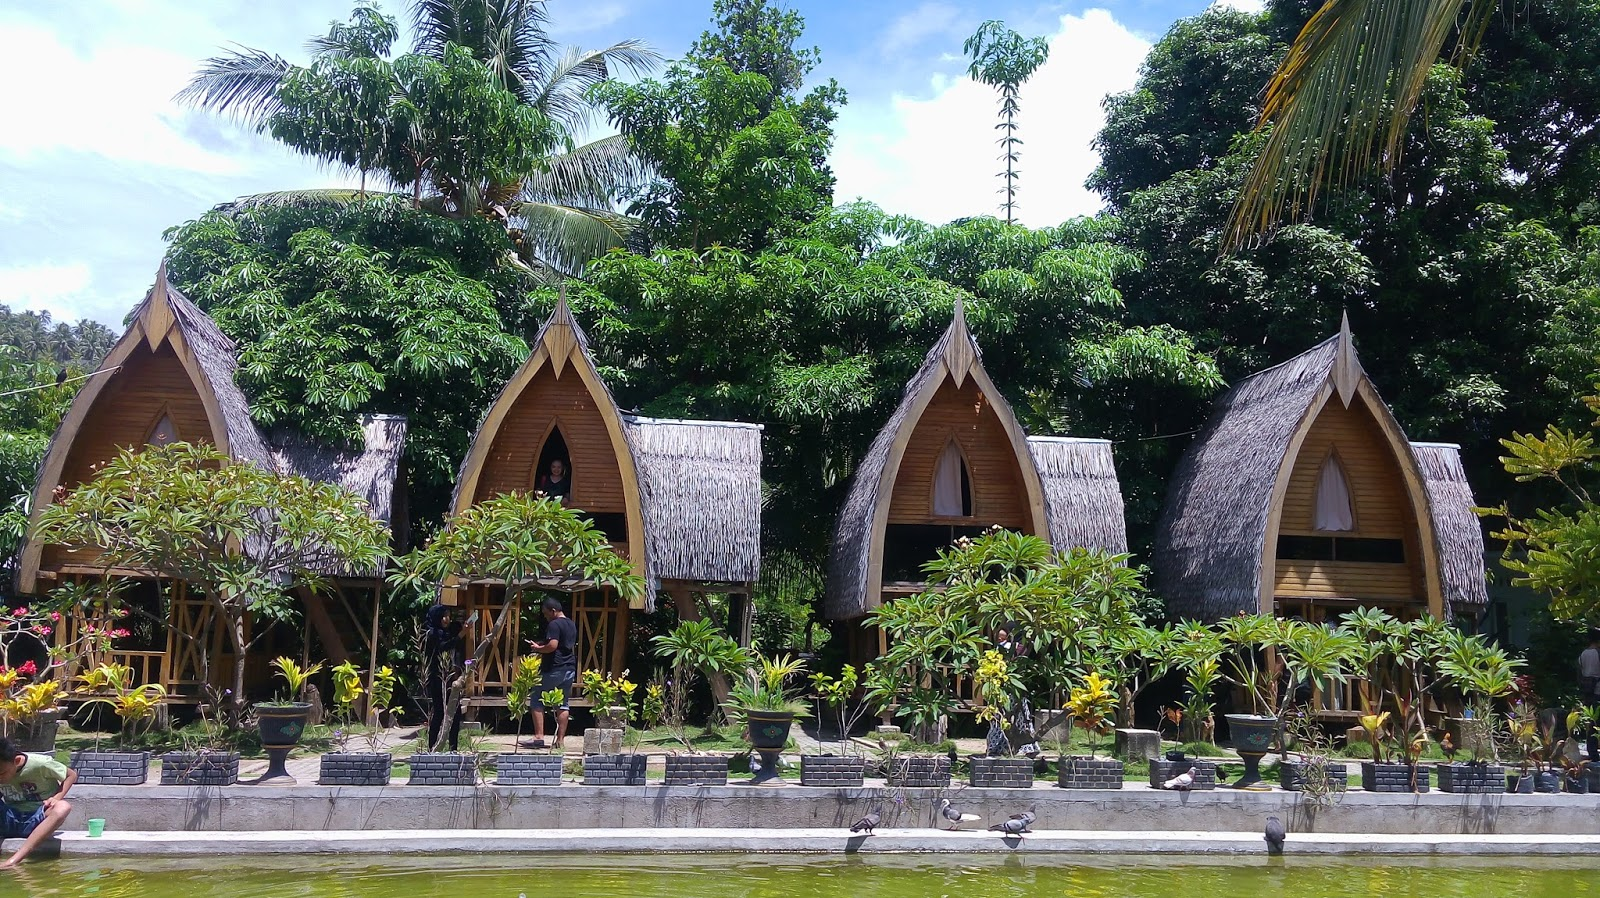 Wisata Religius Desa Bongo Gorontalo Happiness Seeker Oleh Temanku Septi